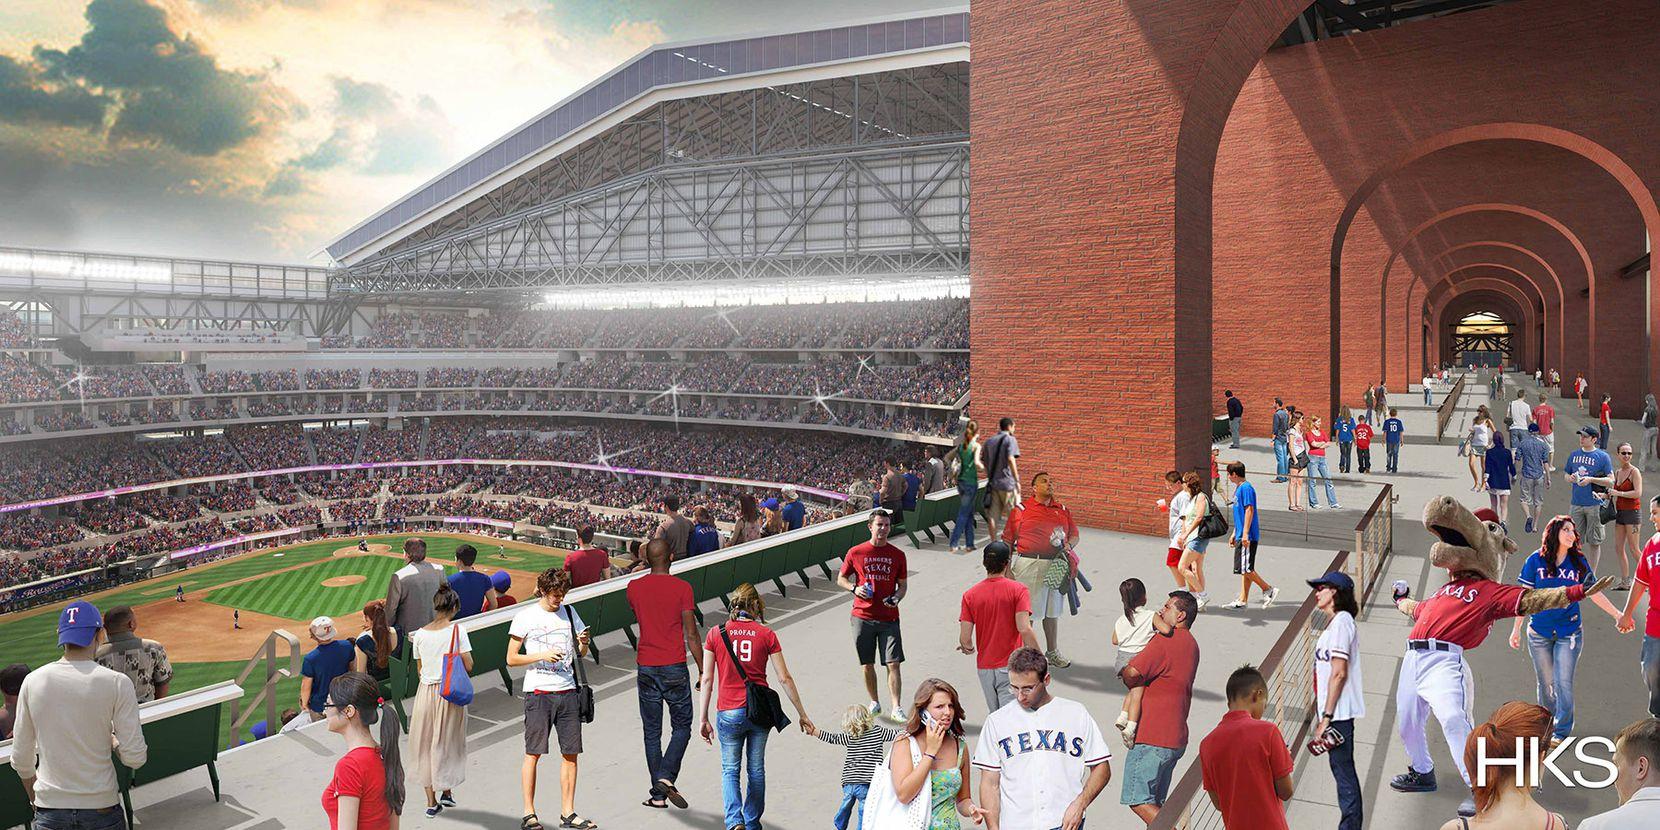 Rendering via the Texas Rangers